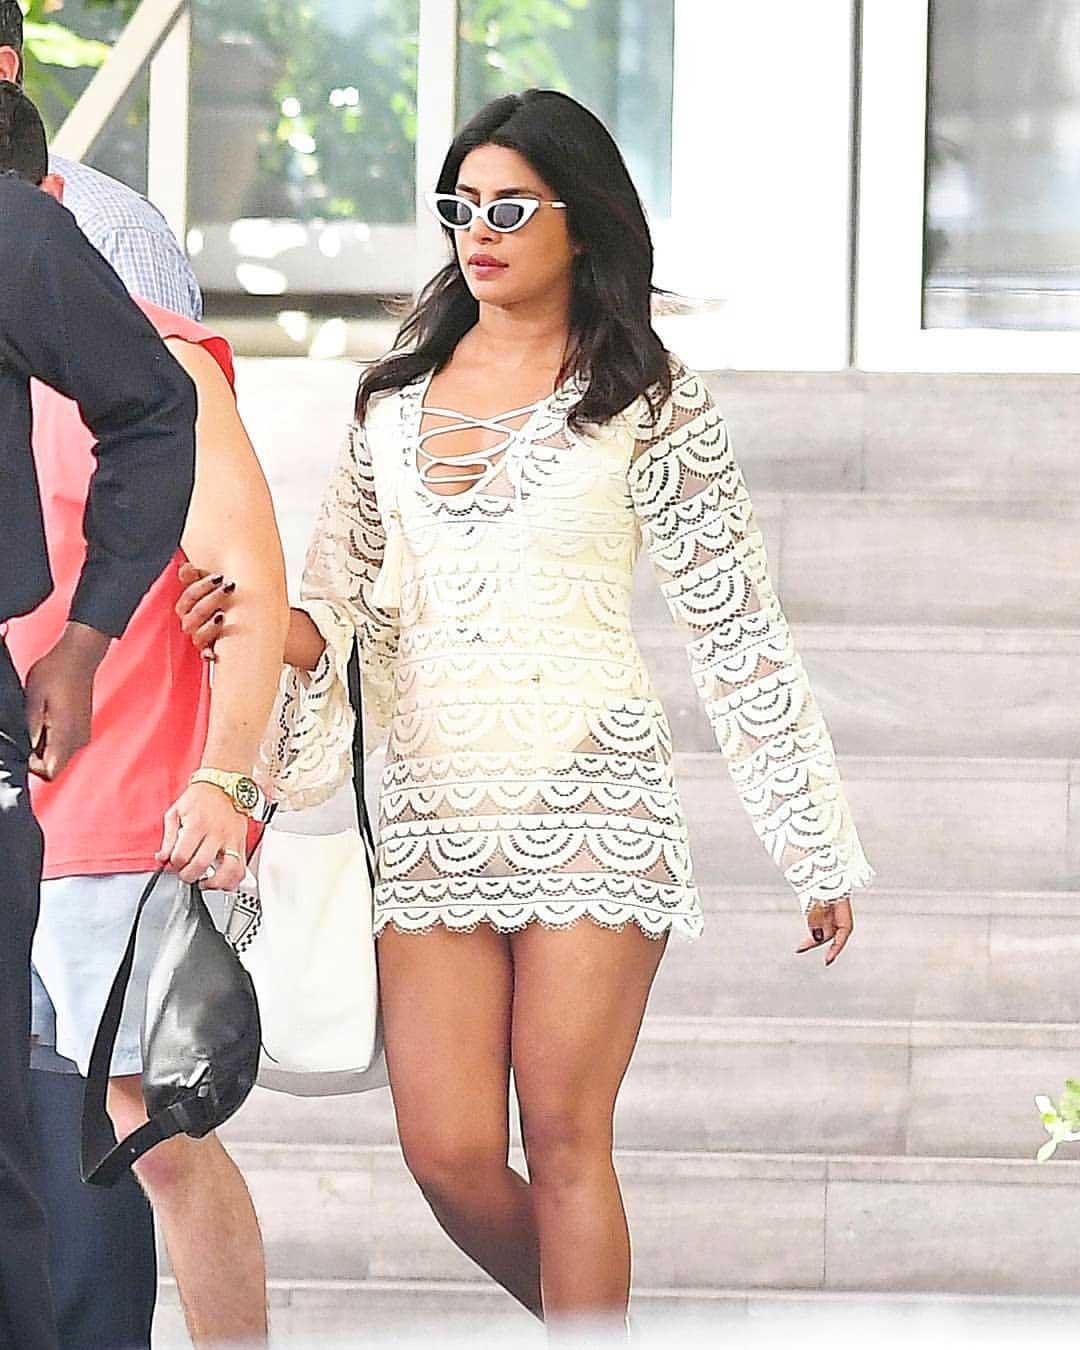 Priyanka Chopra in Swimsuit, Priyanka Chopra in white Swimsuit